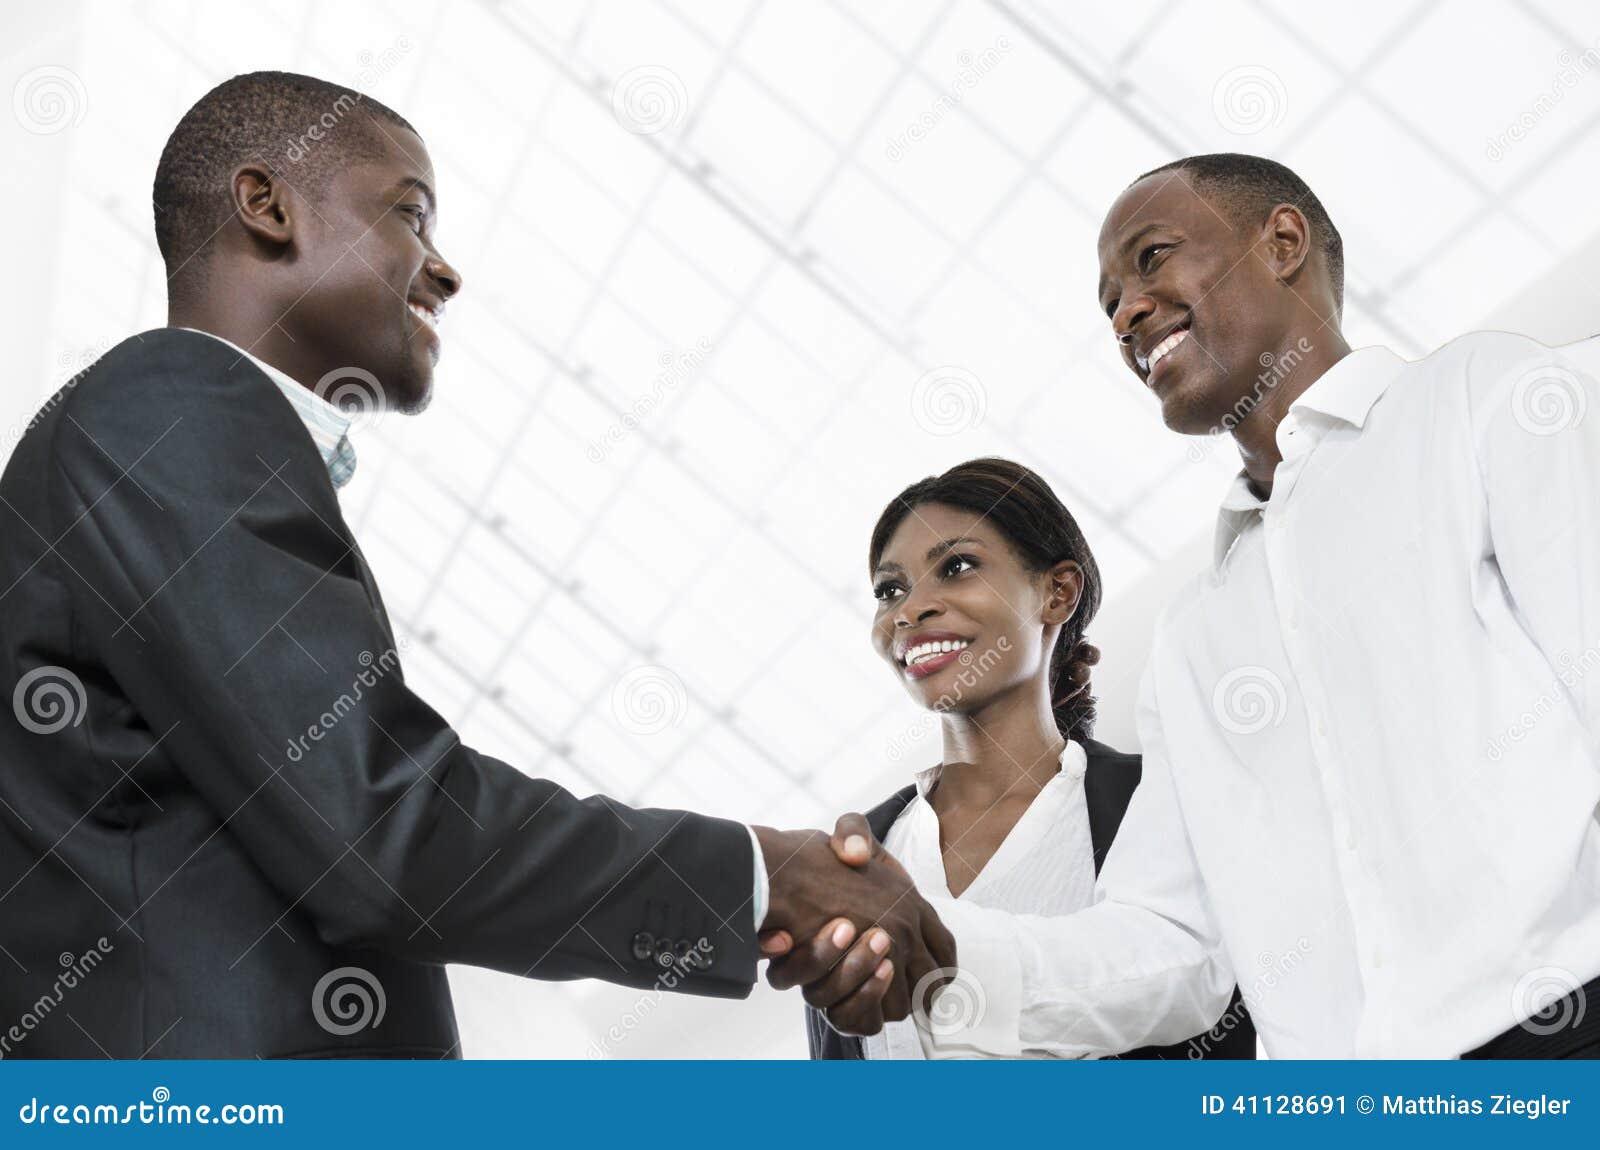 Business people handshake greeting deal at work photo free download - Three African Business People Handshake Stock Image